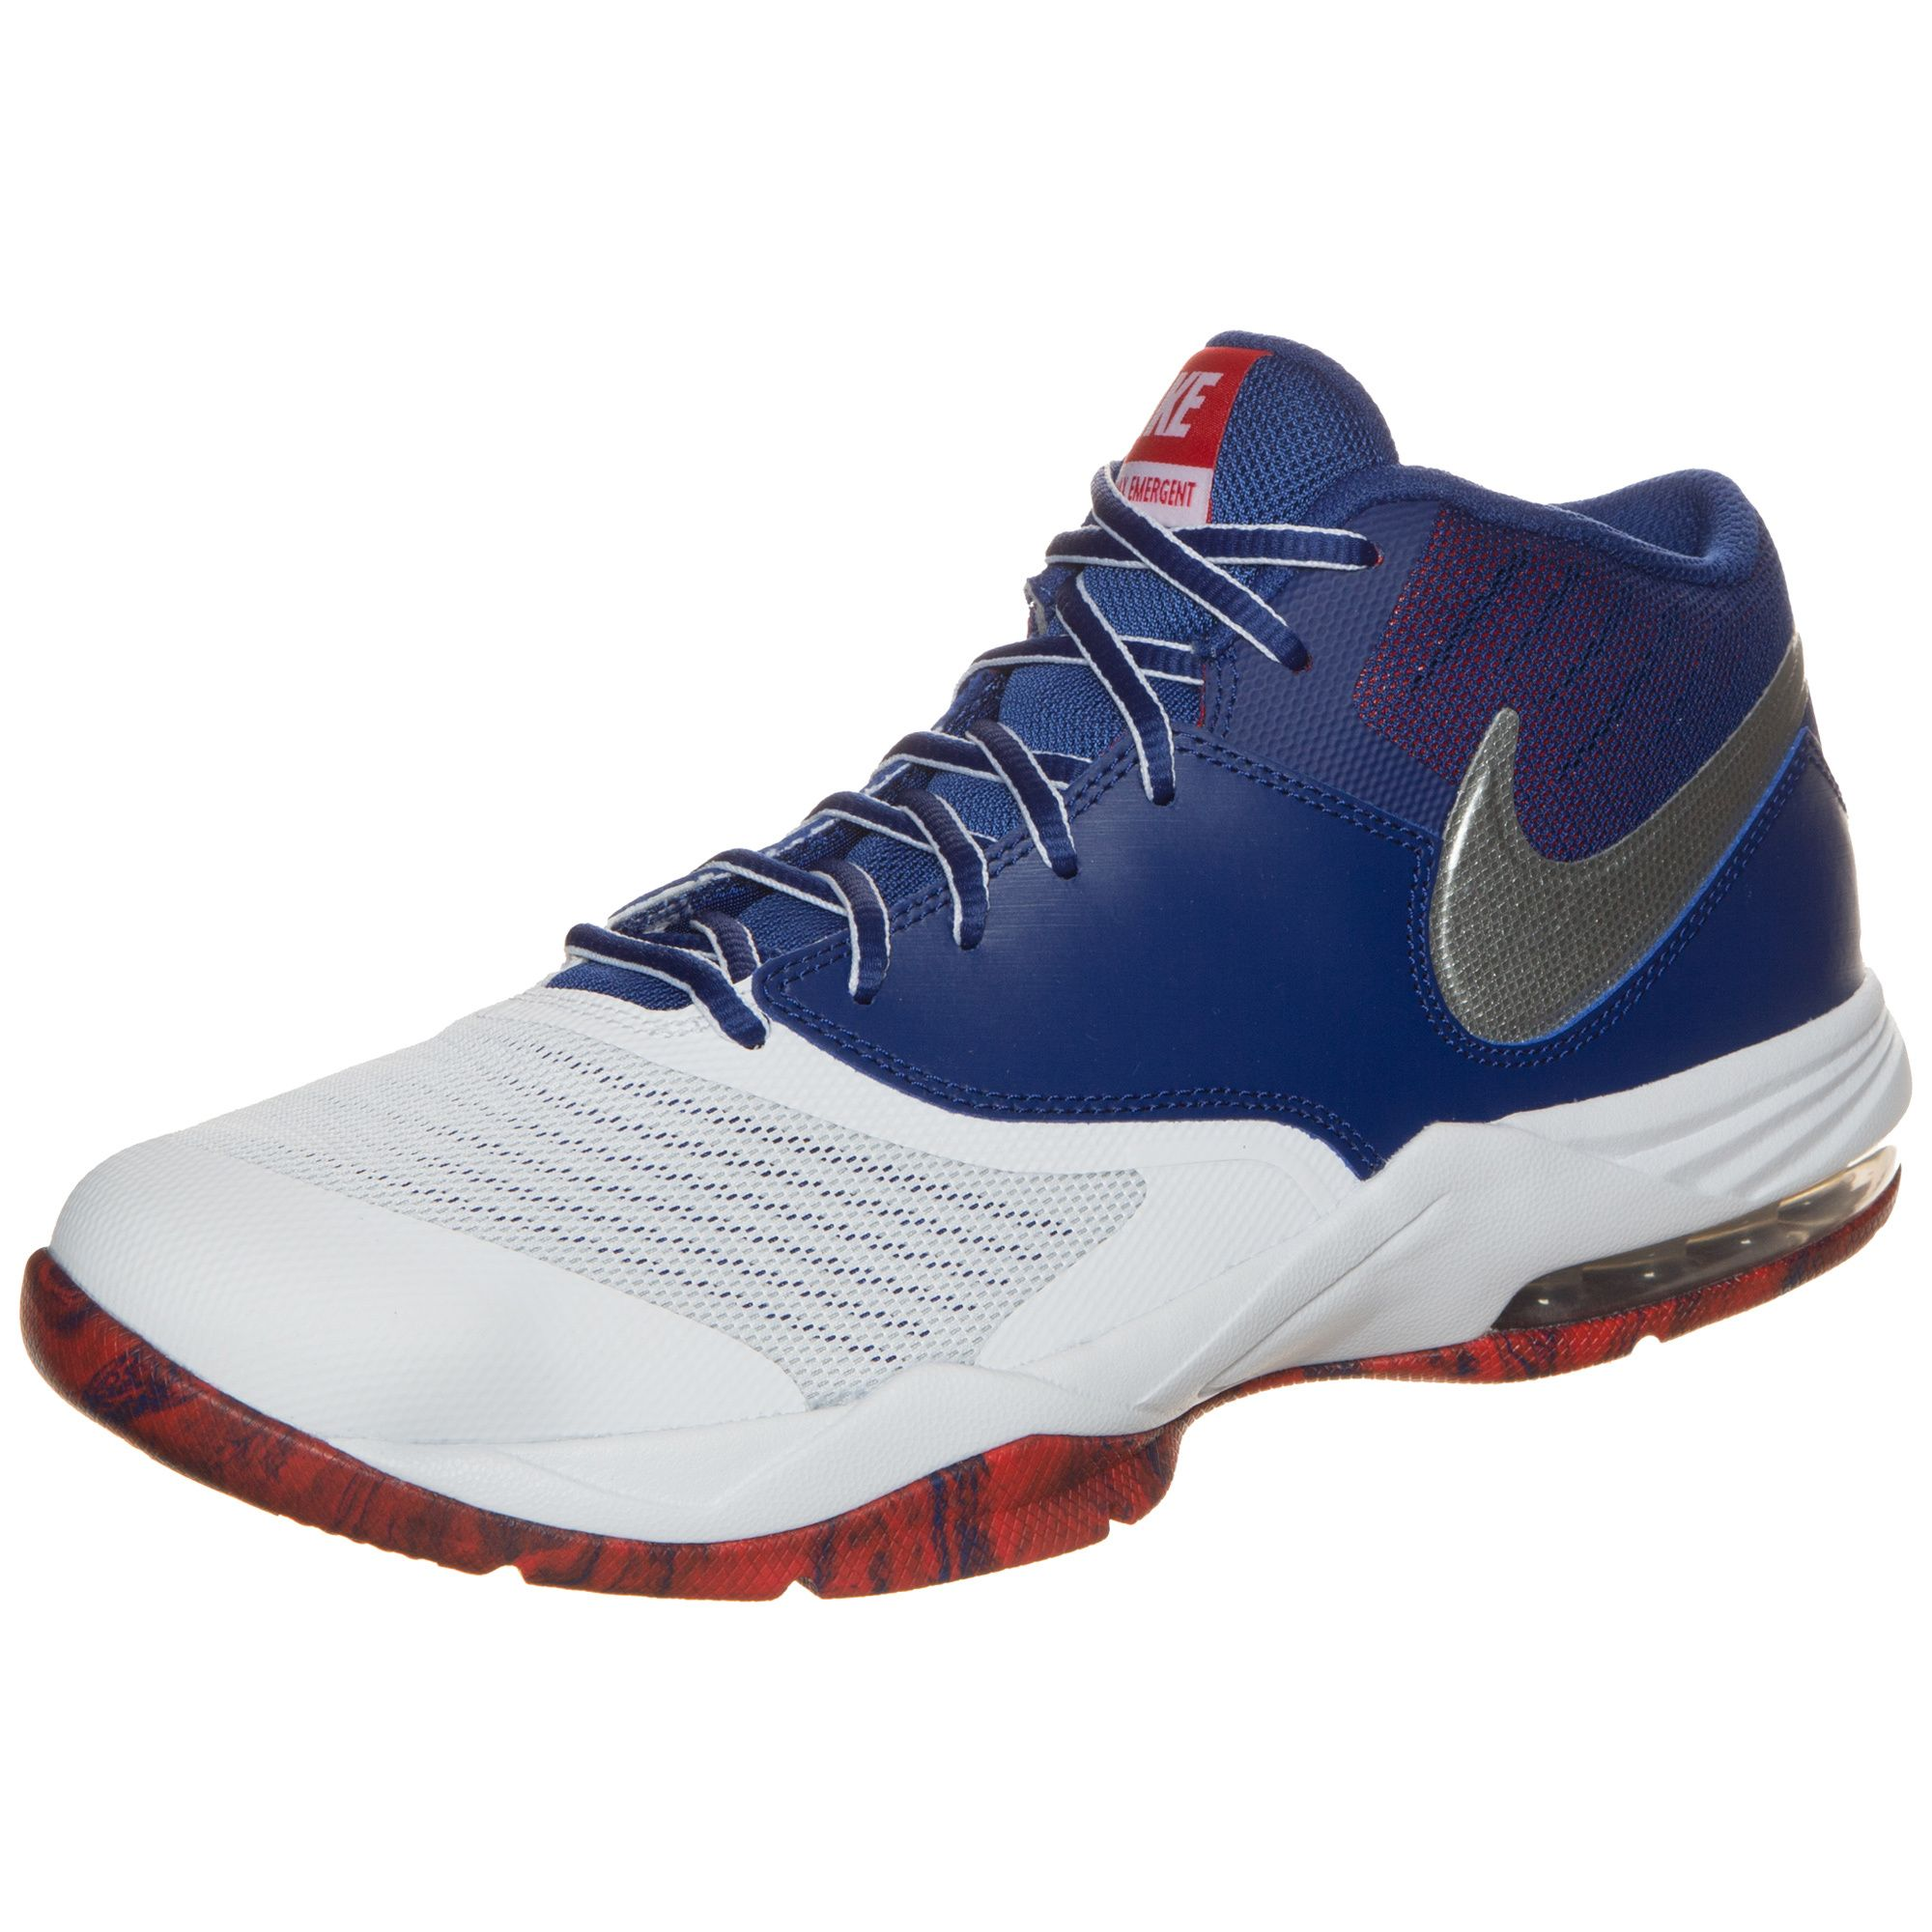 Nike Air Max Herren Ratenzahlung